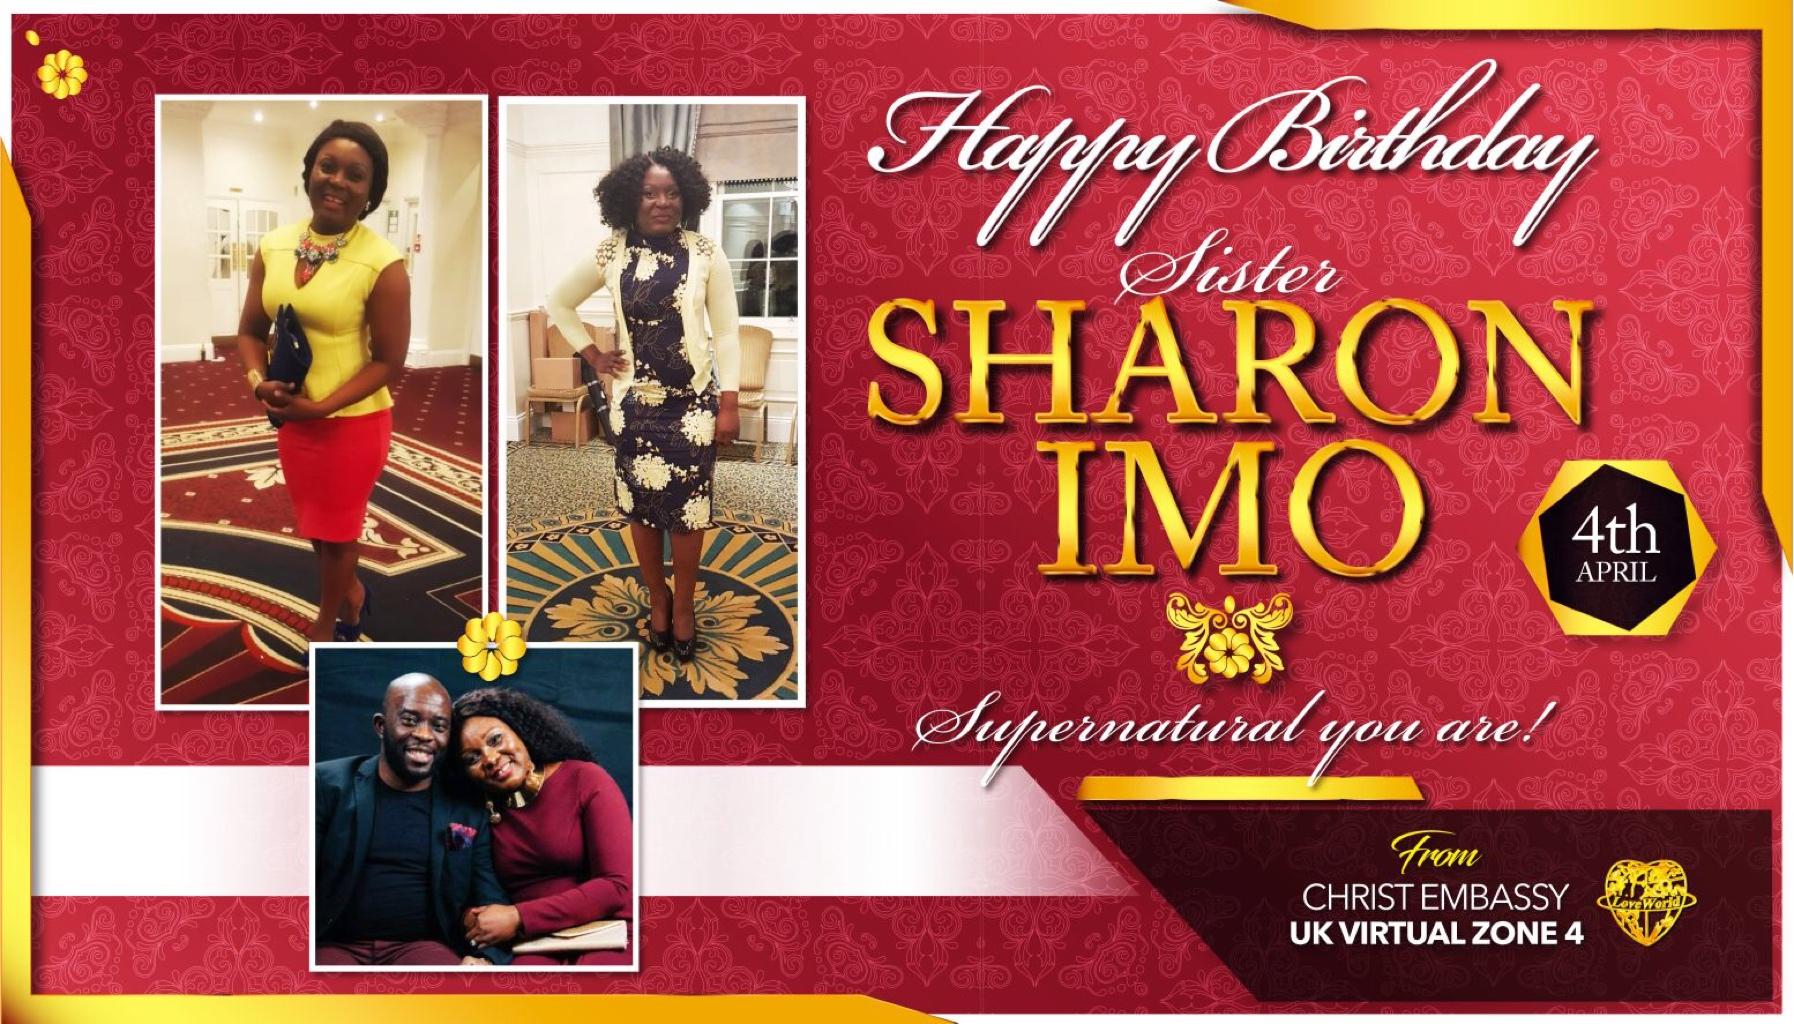 Happy birthday sis Sharon You